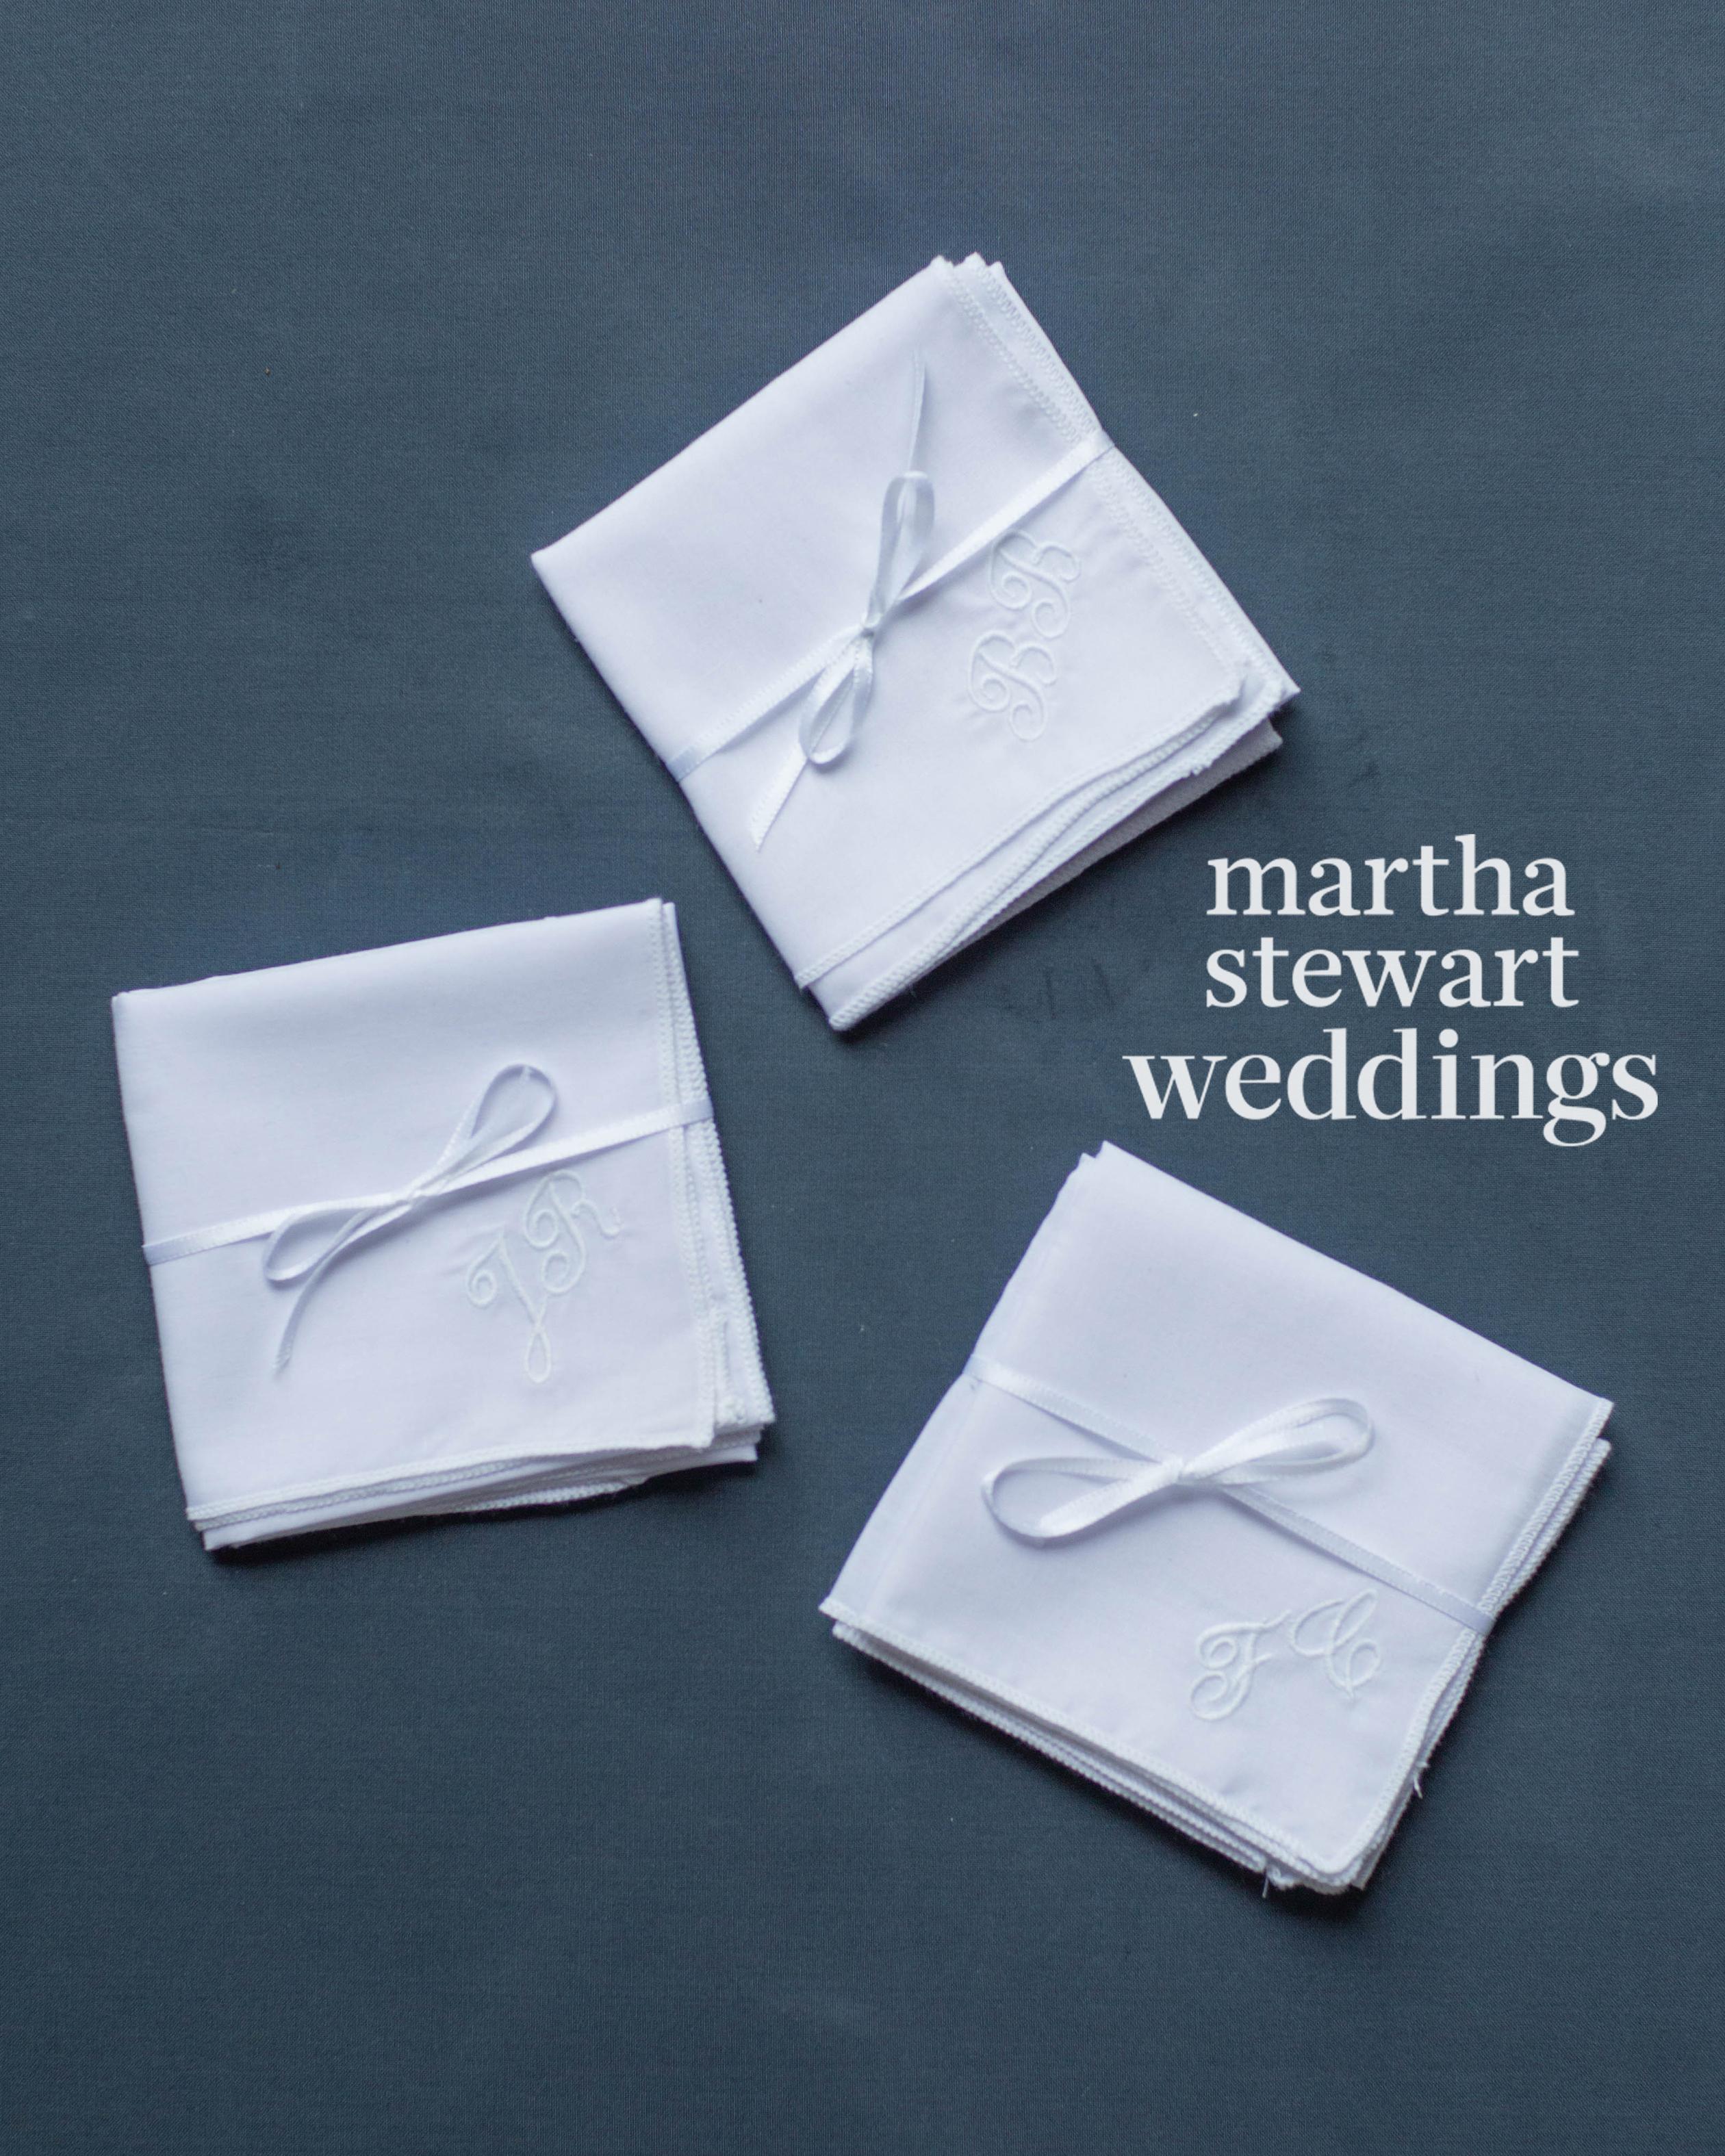 jenny-freddie-wedding-france-024-d112242-handkerchief-watermarked-1215.jpg